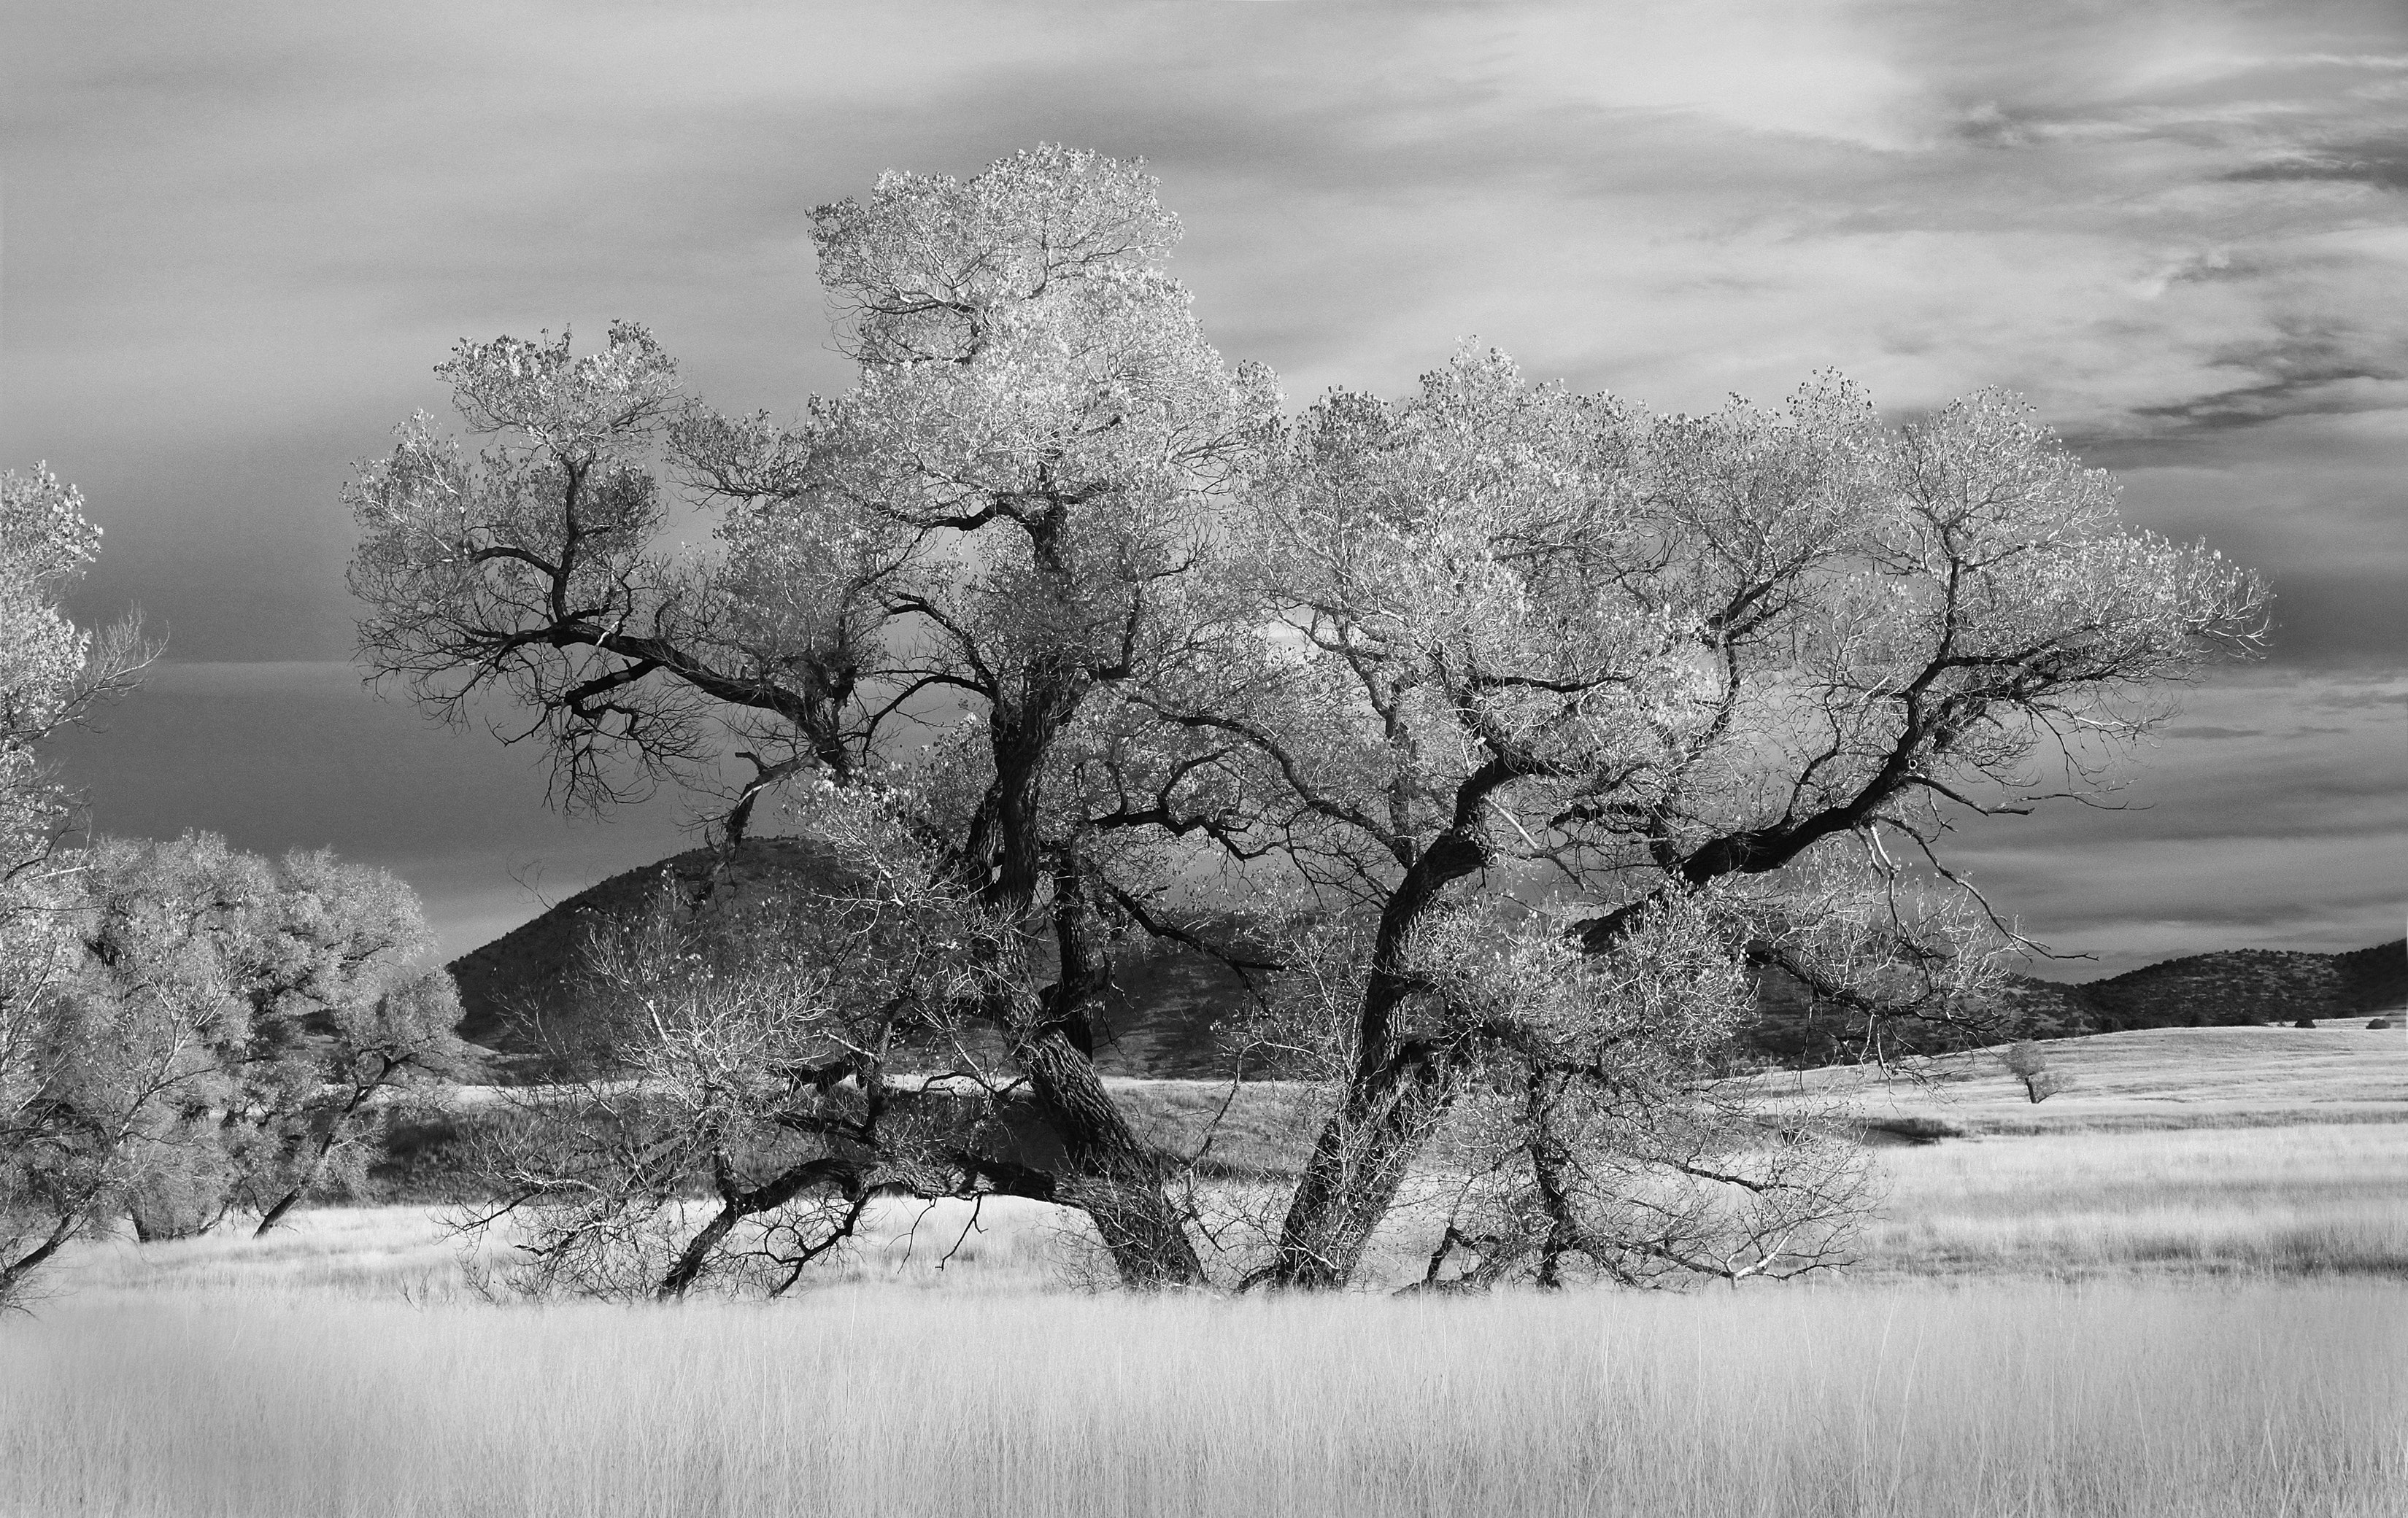 Graysclae of Tree Near Grass, Black-and-white, Grass, Landscape, Mountain, HQ Photo